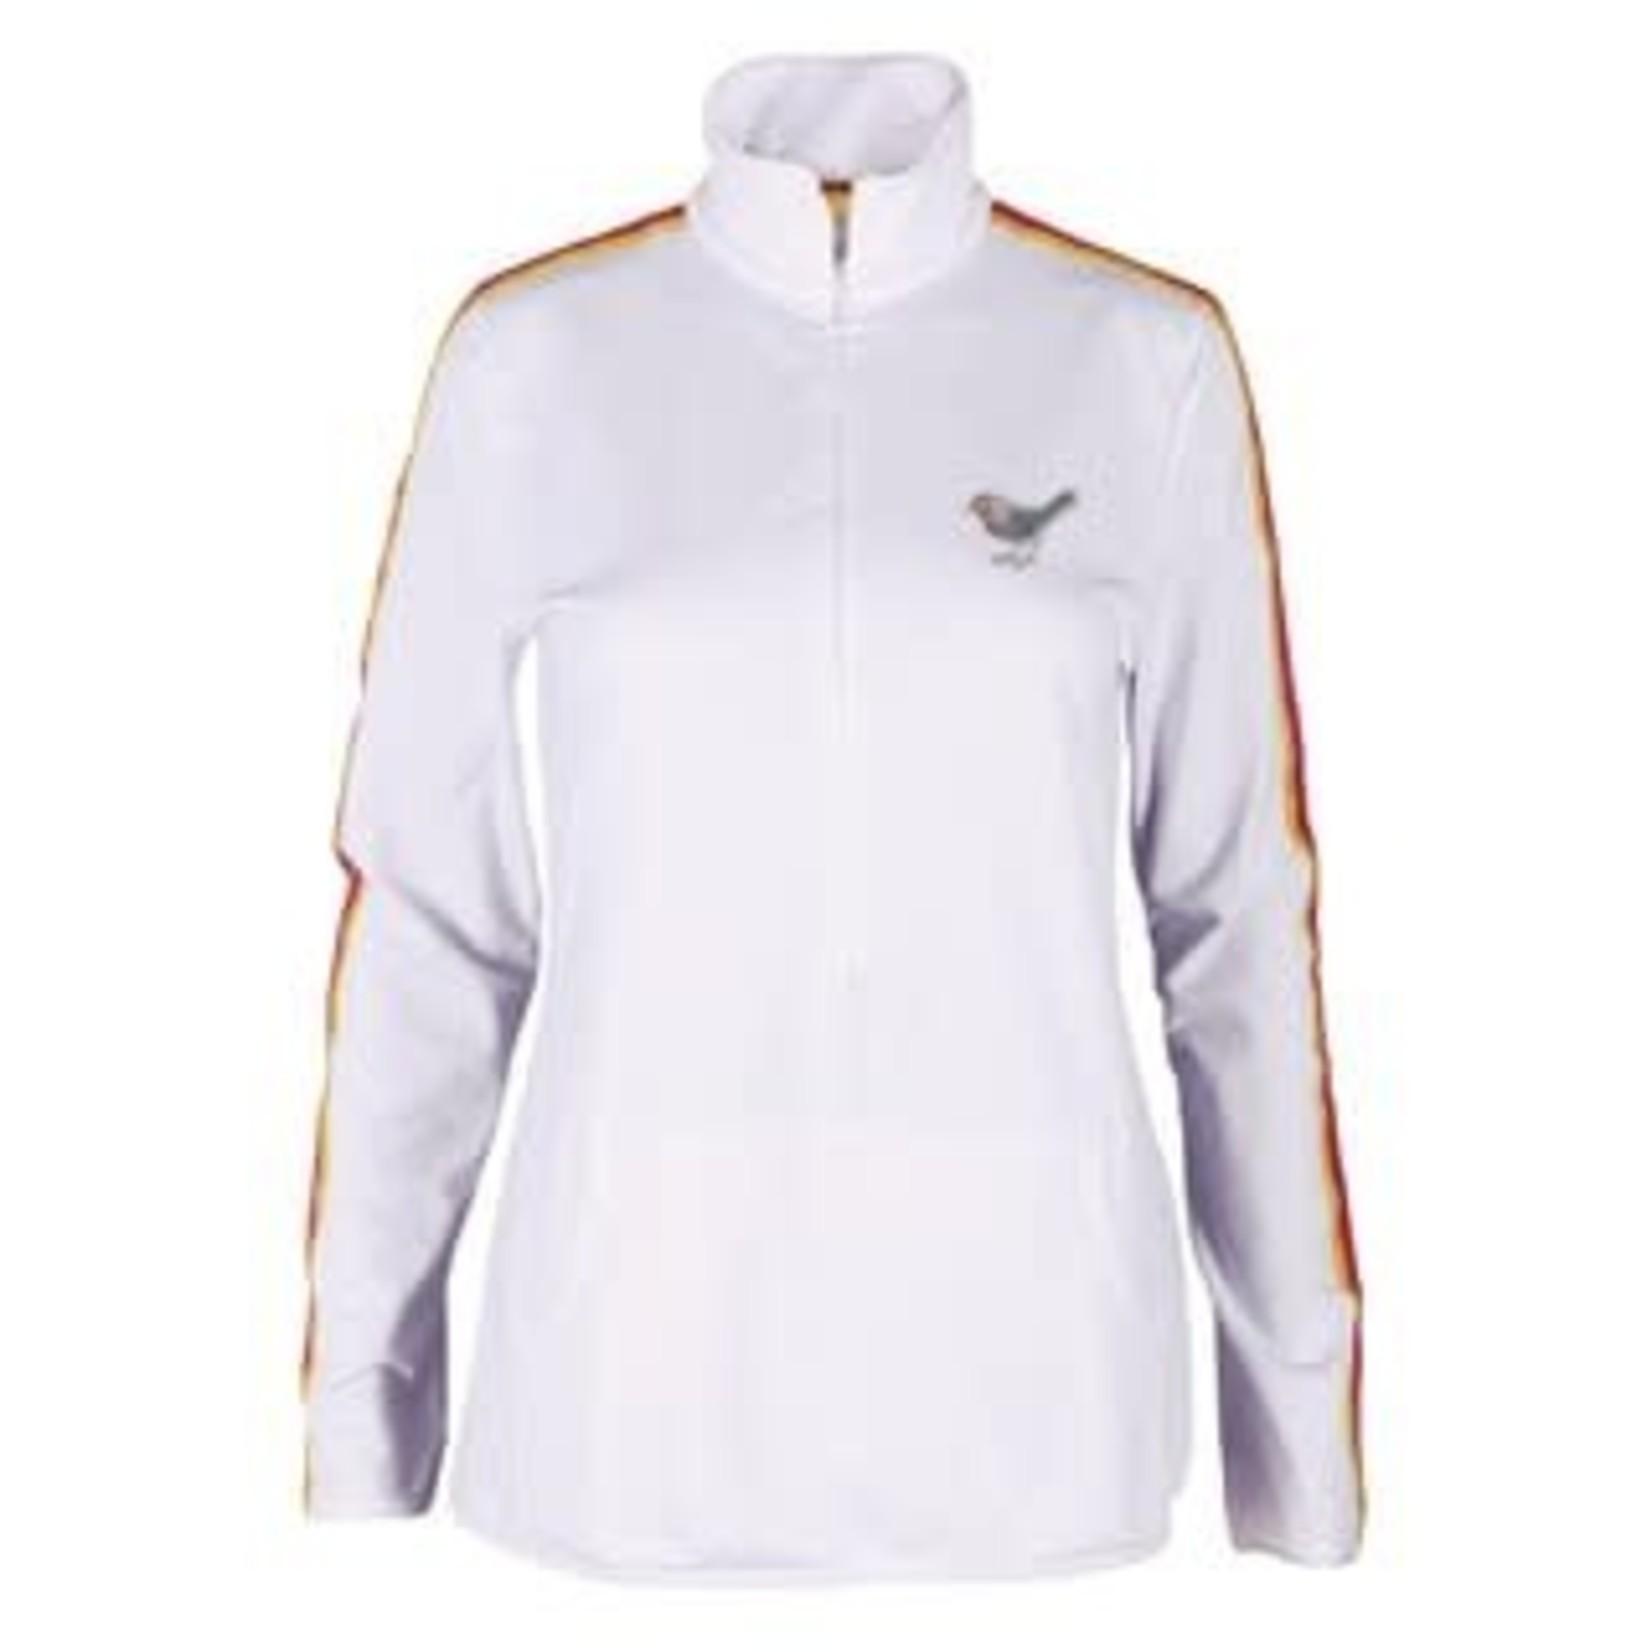 Girls Golf Girls Golf Sweat Techy Multicolored Band Long Zipper White